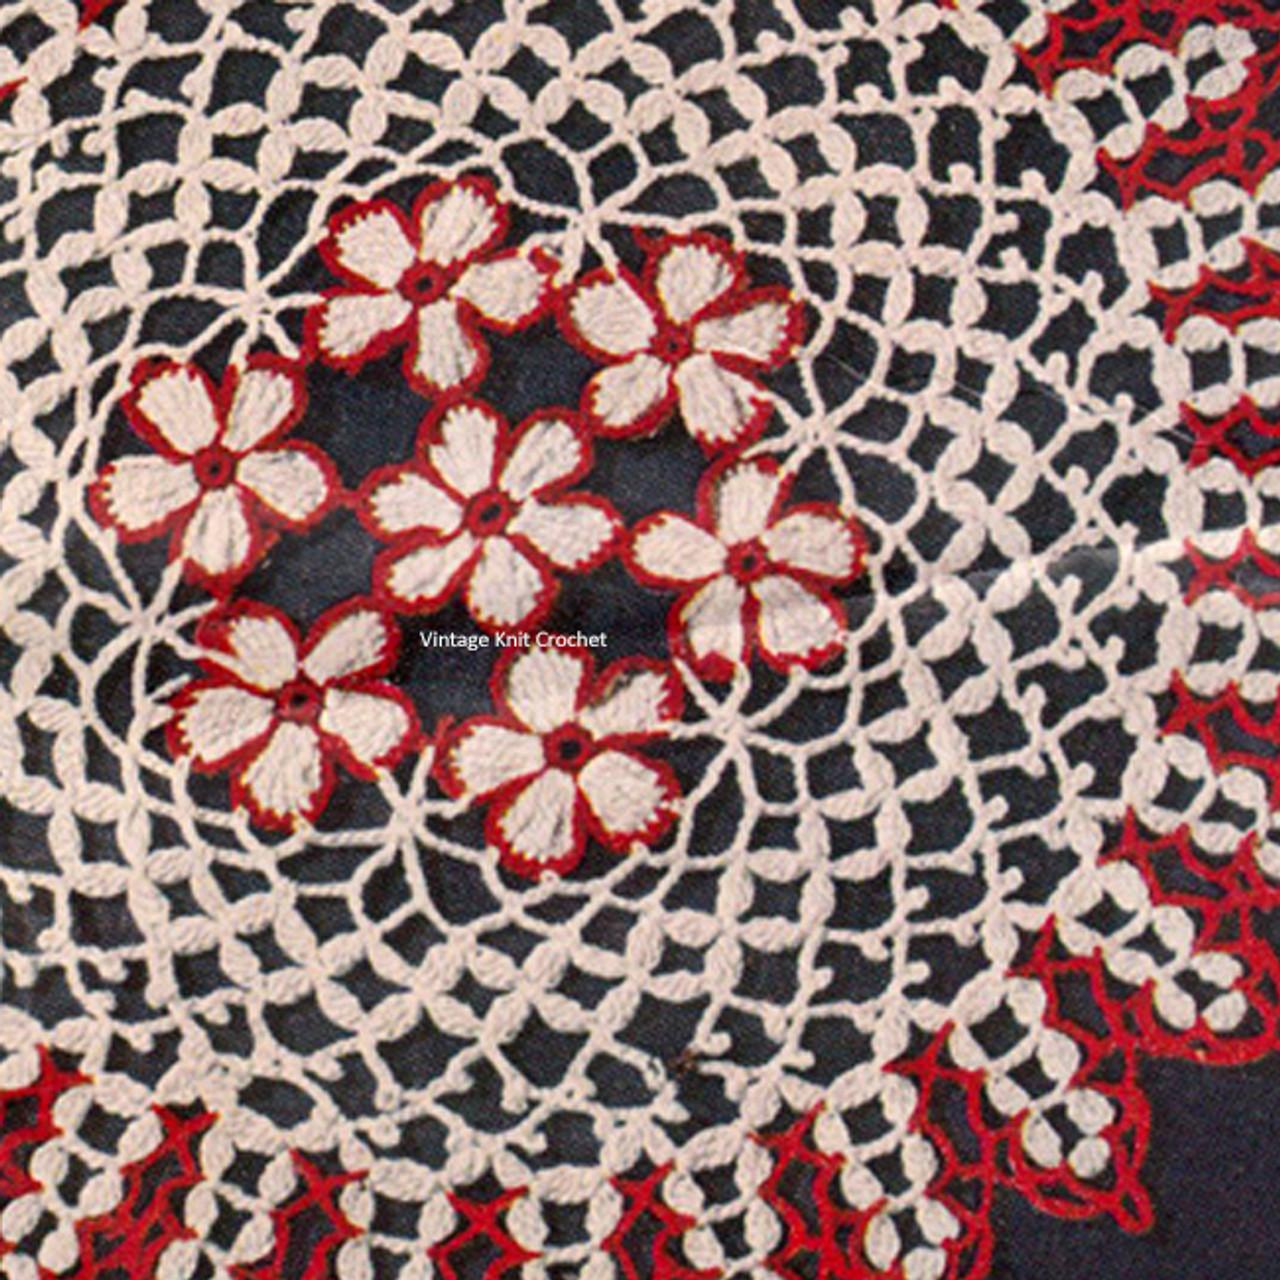 Crochet Doily Pattern, Center Daisy Motif